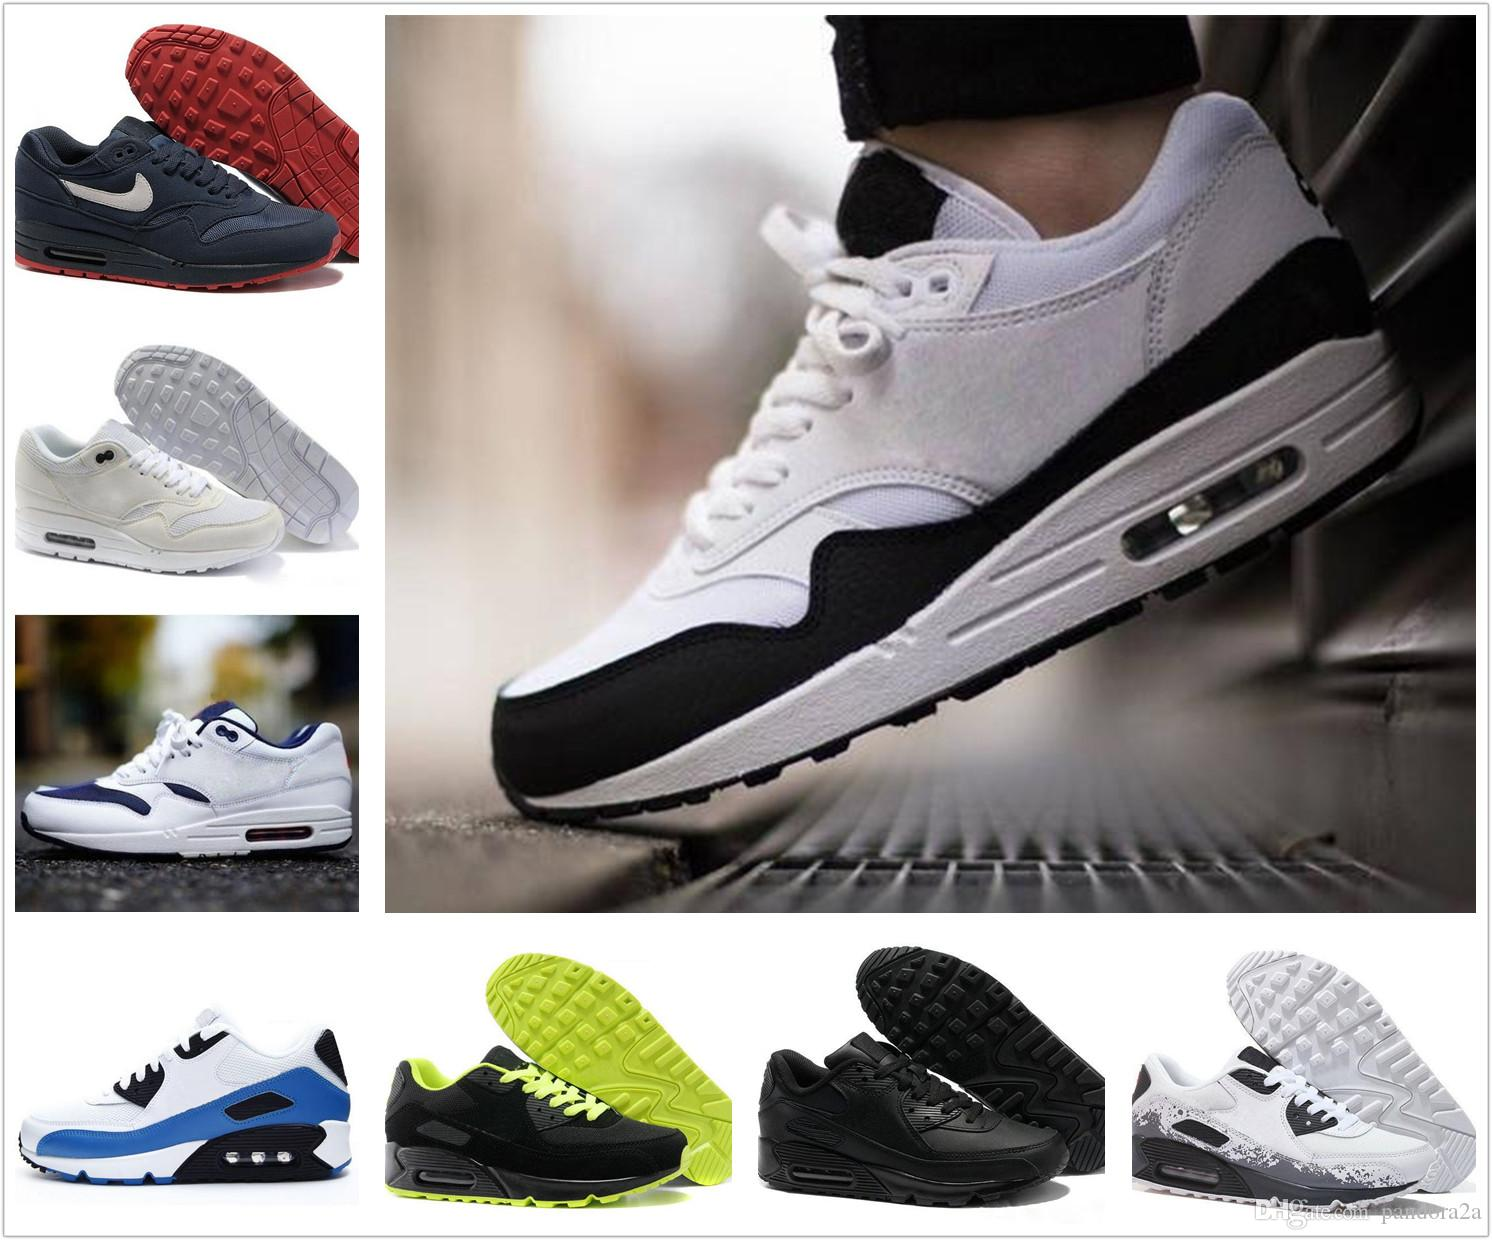 ce014668 Купить Оптом Nike Air Max Airmax 87 90 New Arrivel Бесплатная Доставка  Знаменитые 87 90 Ultra 1 Elephant Black Clear Jade White Мужская Женская  Кроссовки ...